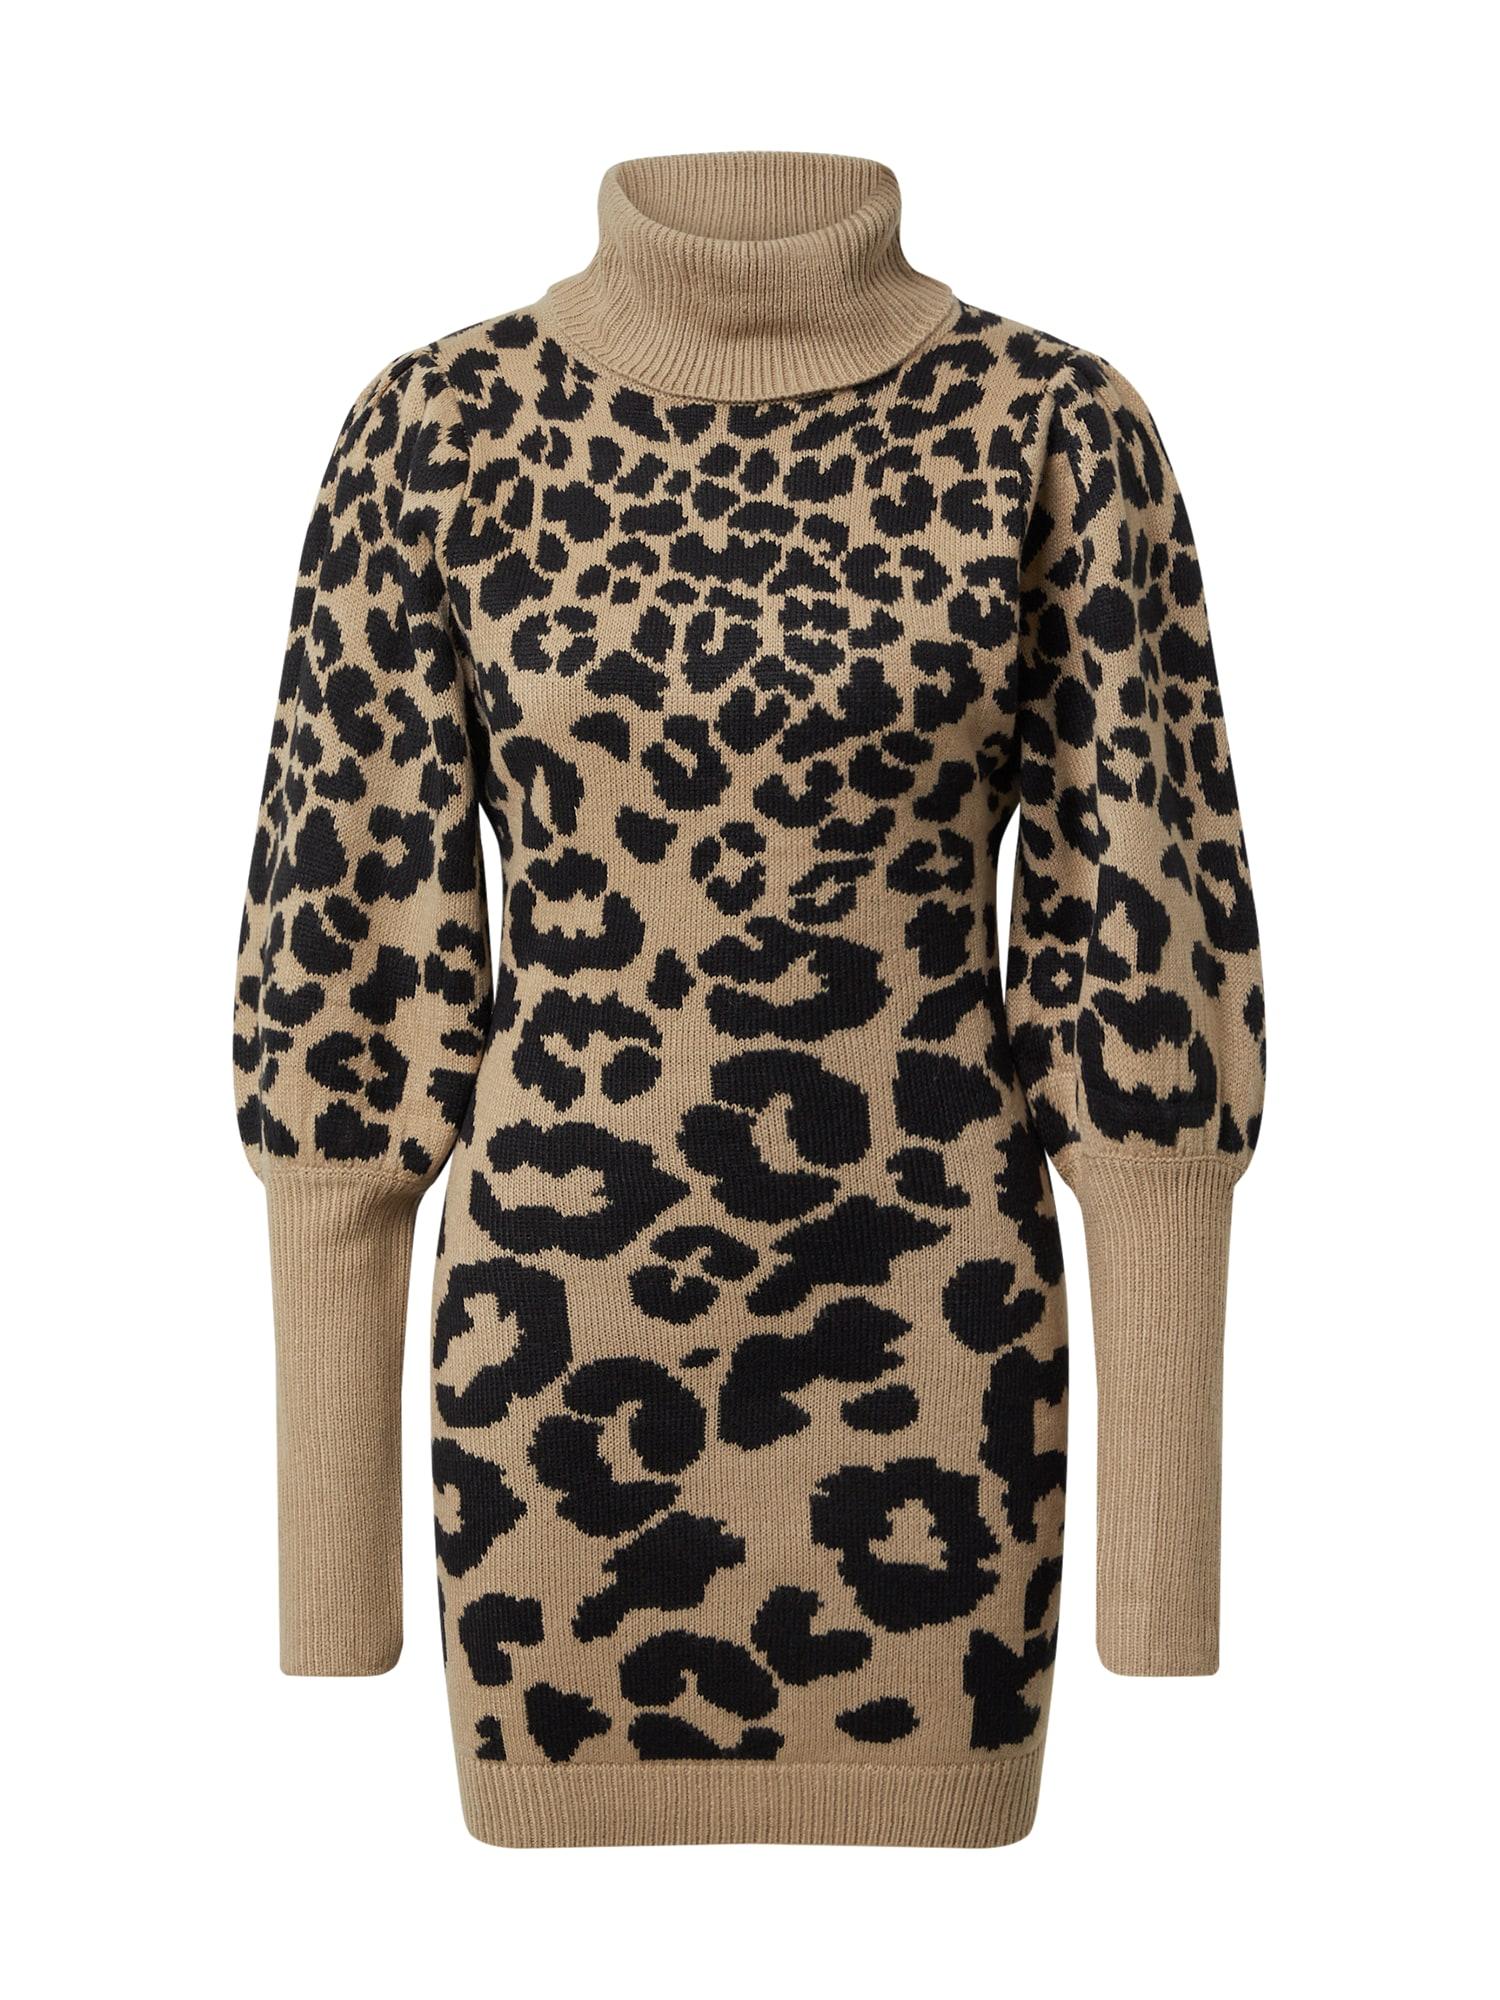 AX Paris Suknelė juoda / gelsvai pilka spalva